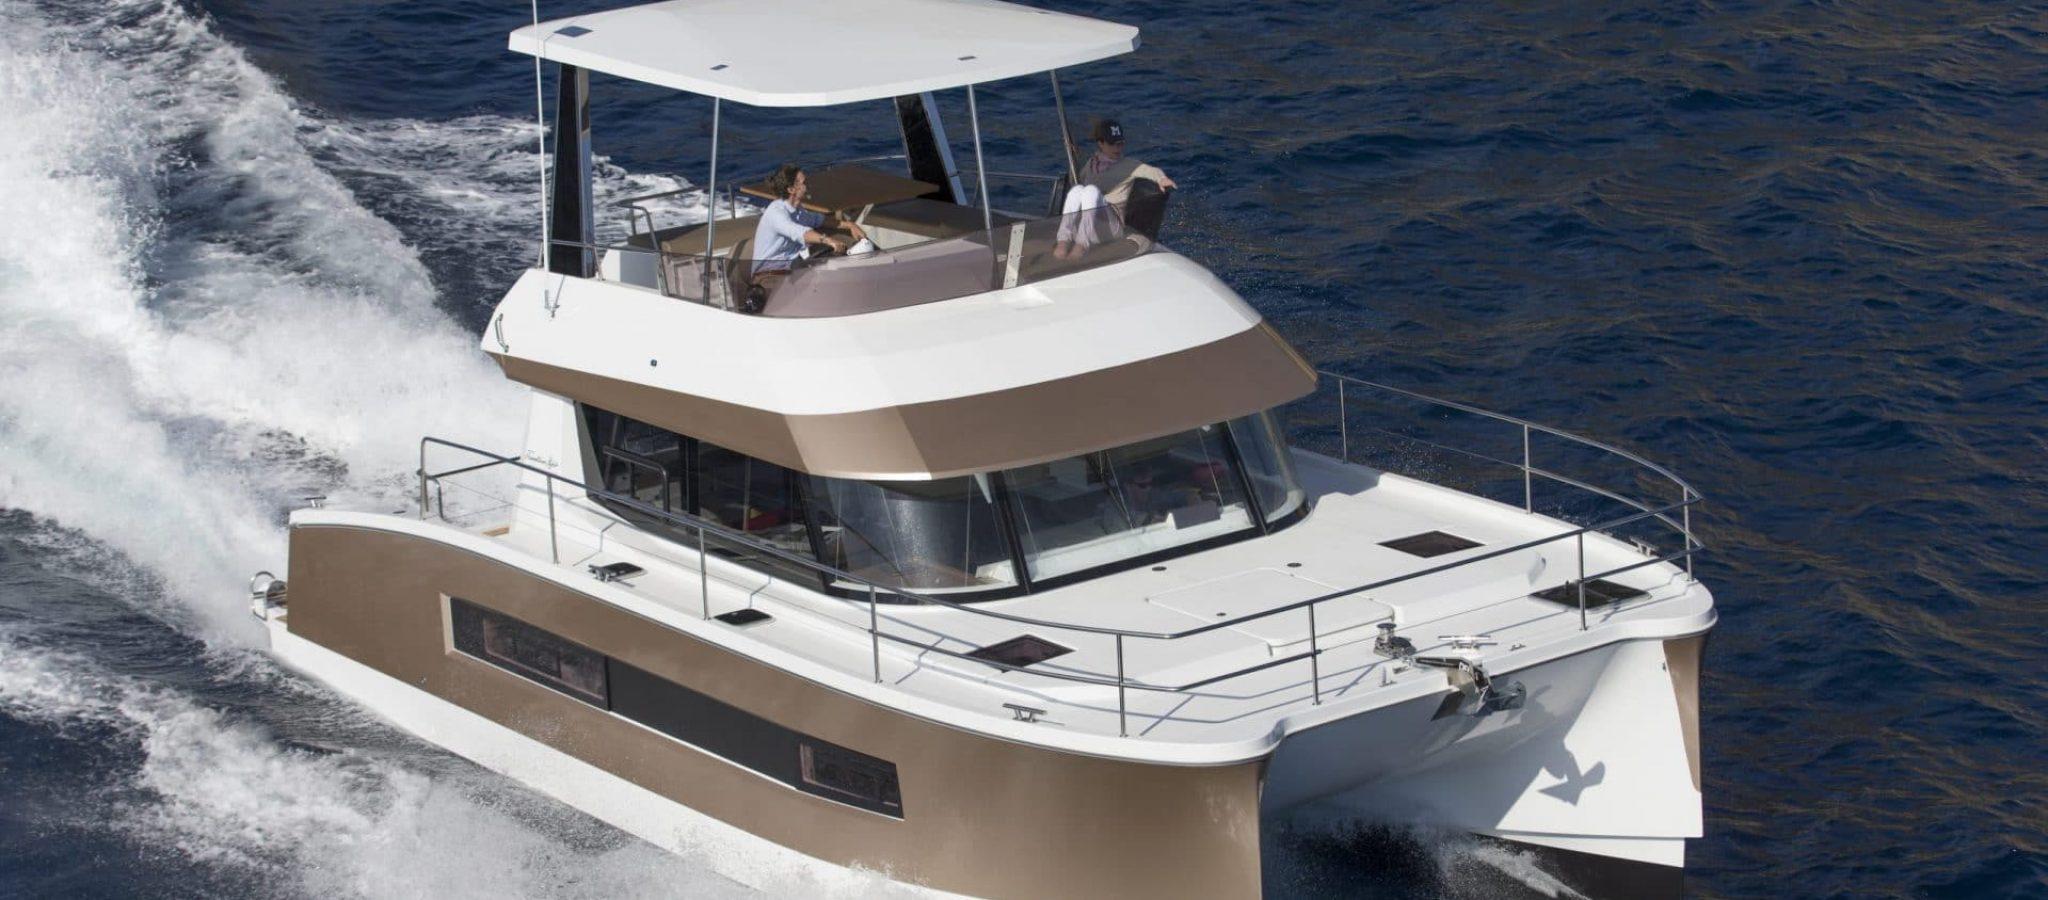 08/04/2015, Andraitx (Isla de Mallorca, Islas Baleares, ESP), Chantier Fountaine-Pajot, Motor Yacht 37